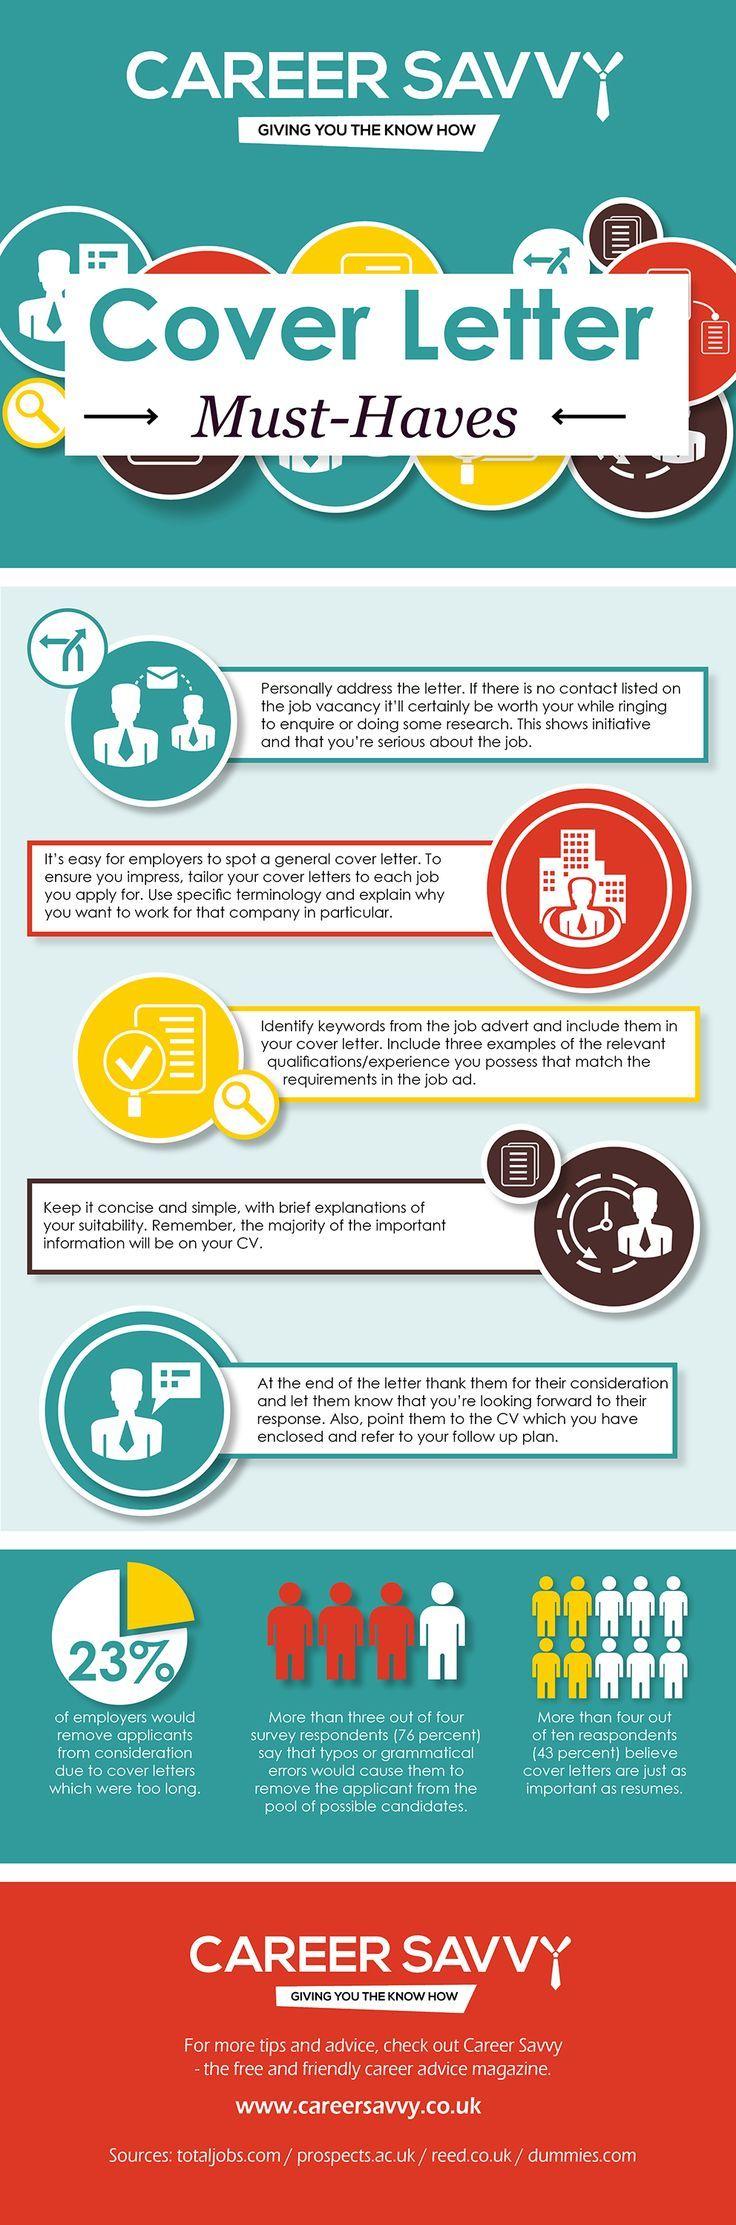 Cover Letter Tips Delectable 11 Best Cover Letters Images On Pinterest  Resume Tips Resume Decorating Design